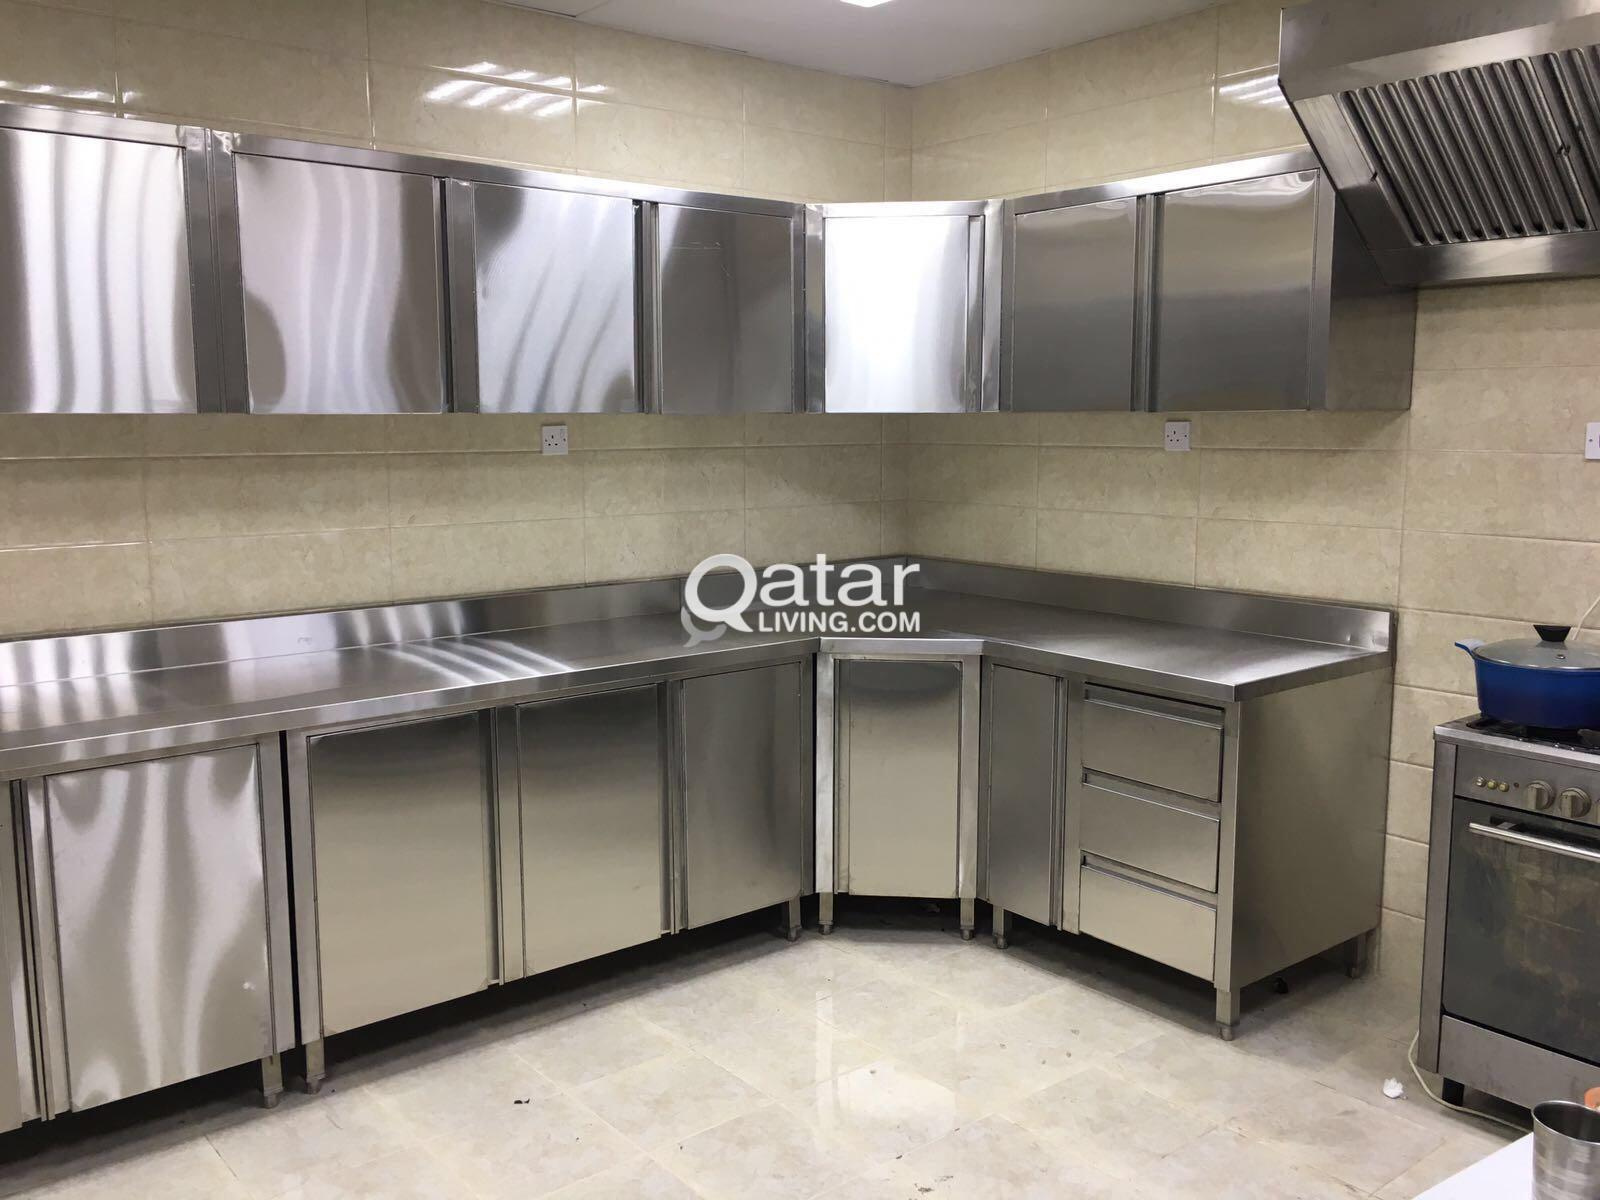 Kitchen equipment and maintenance services | Qatar Living